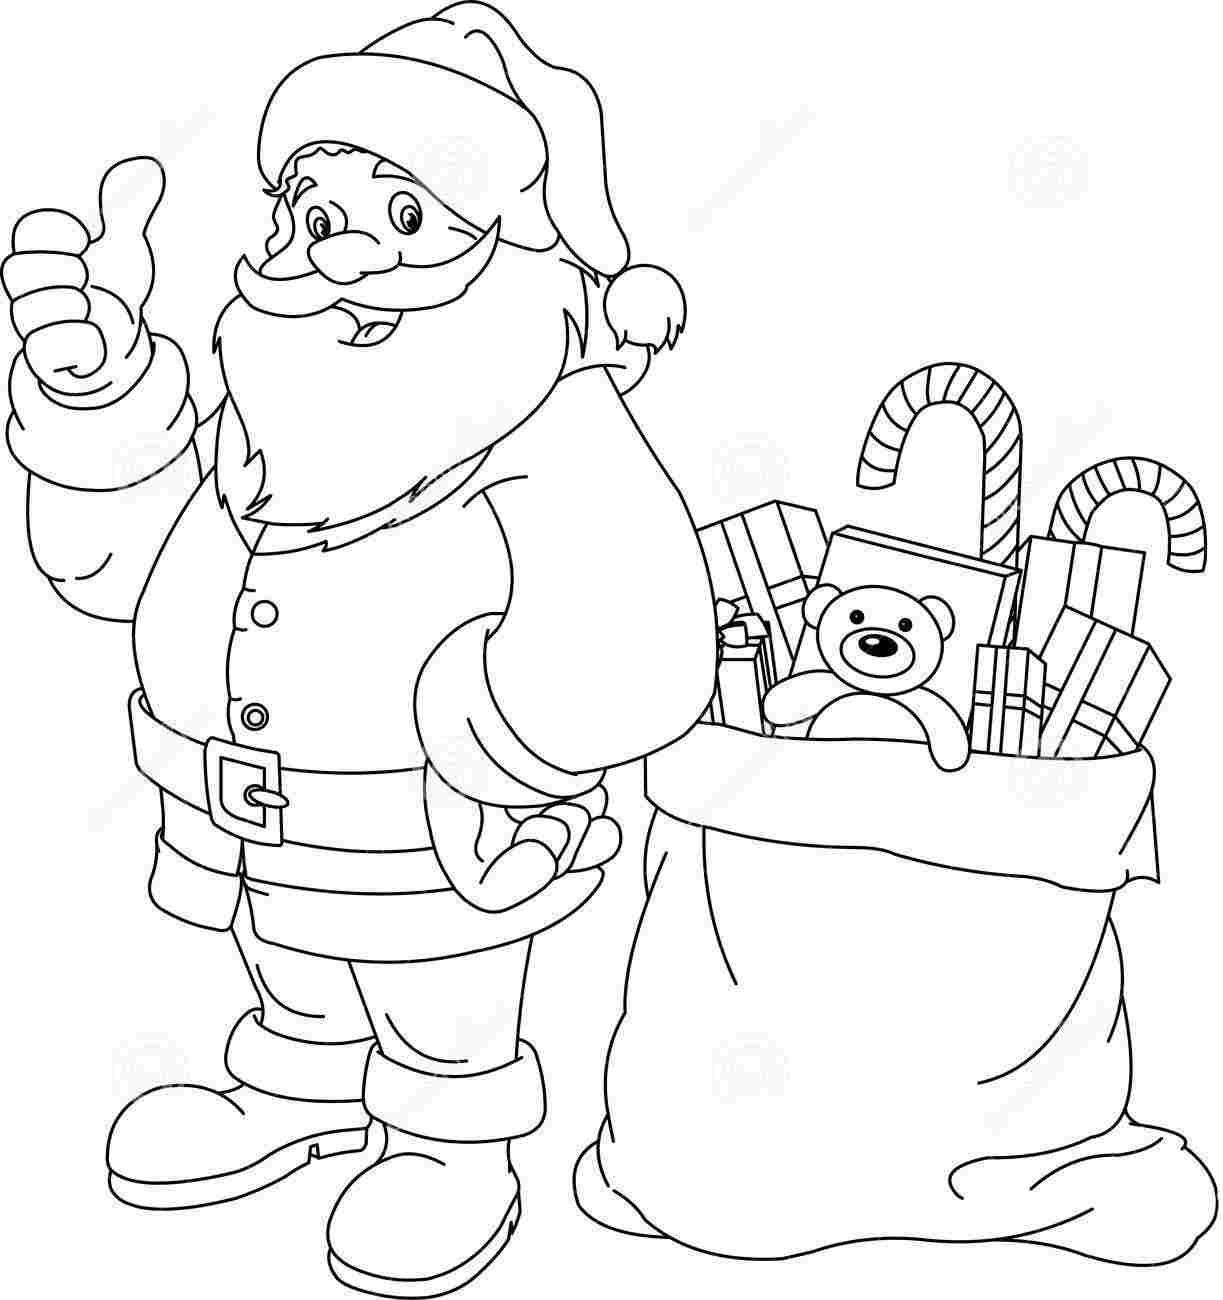 Santa Claus Coloring Pages 01